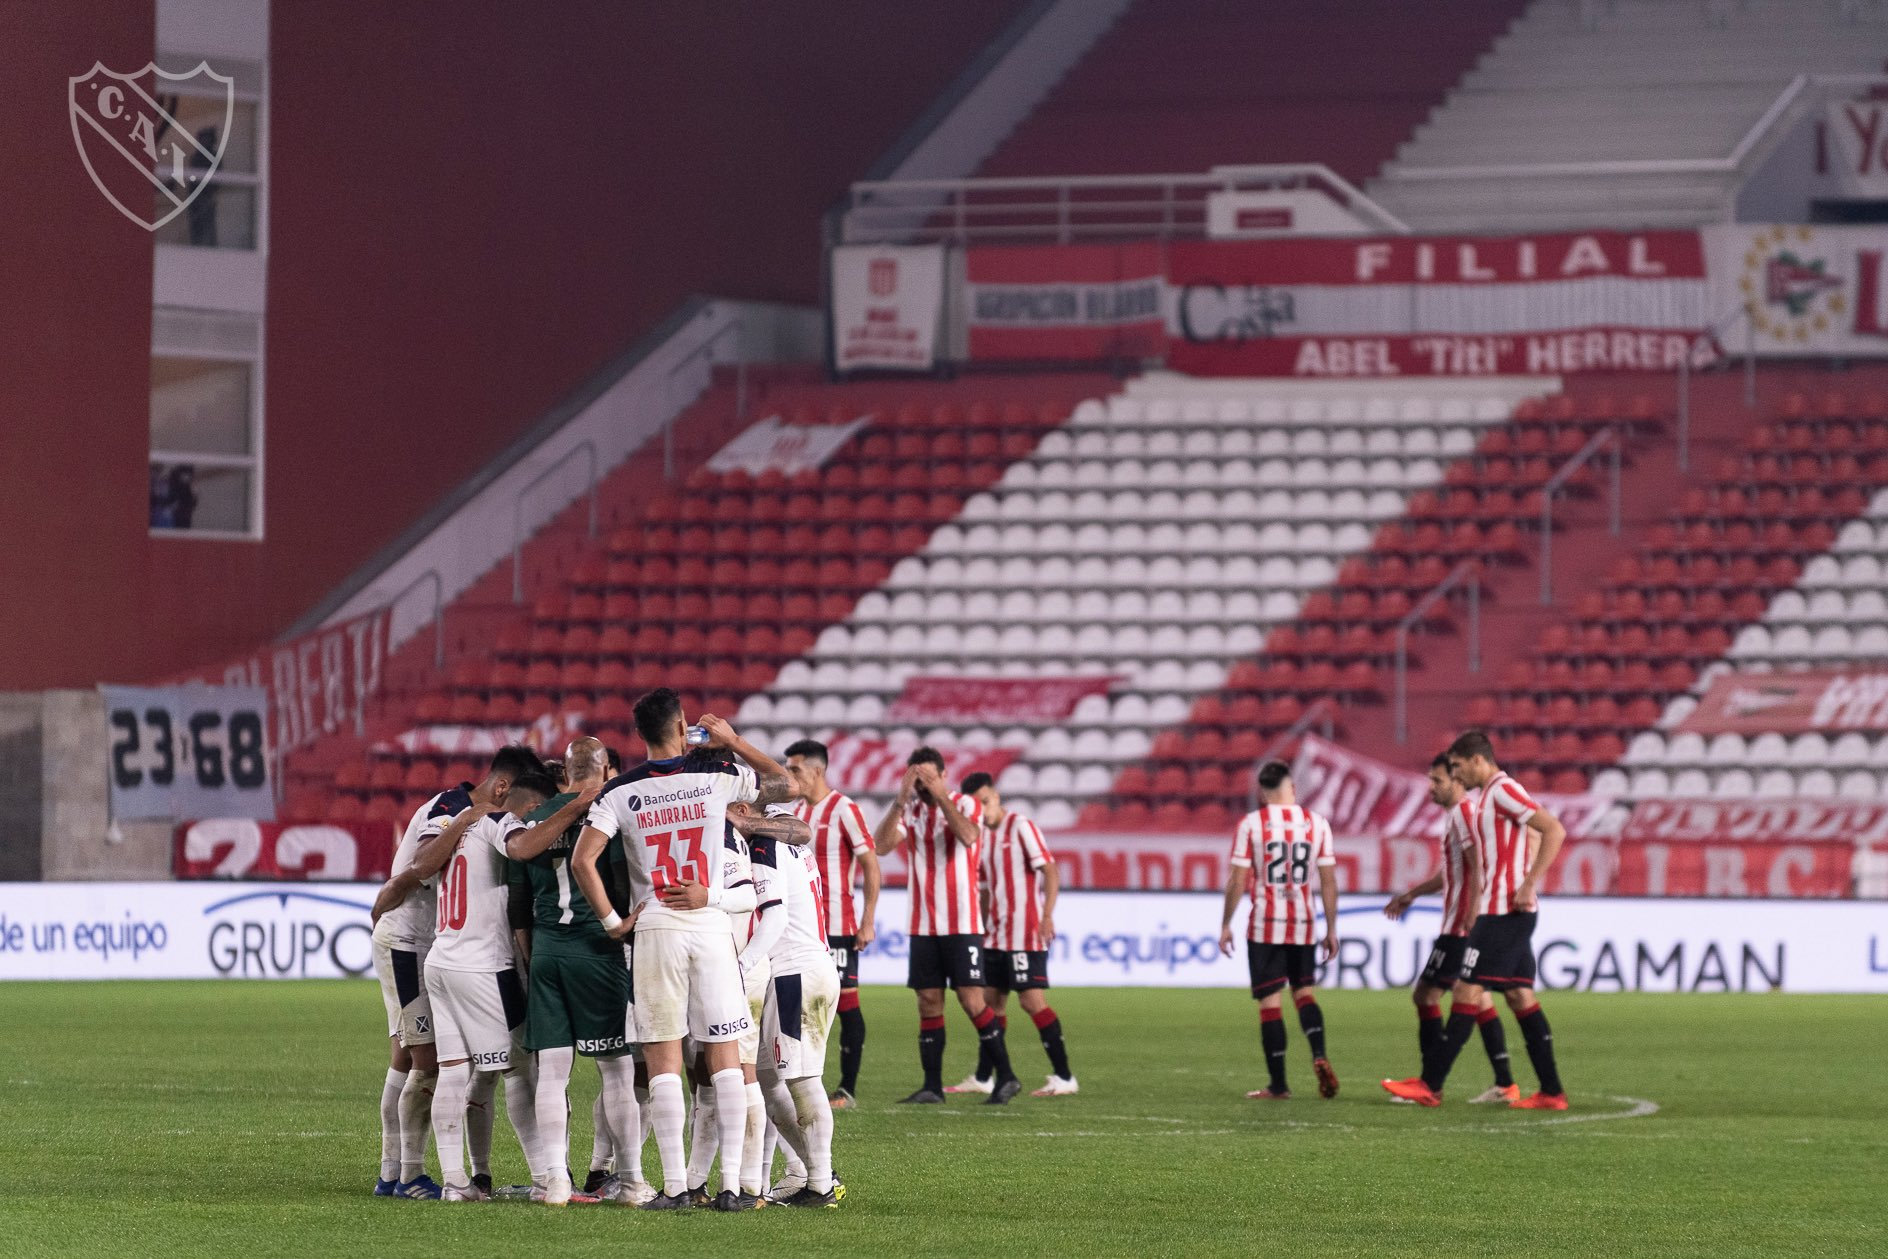 Independiente va a ir a la Plata para enfrentar a Estudiantes este domingo.